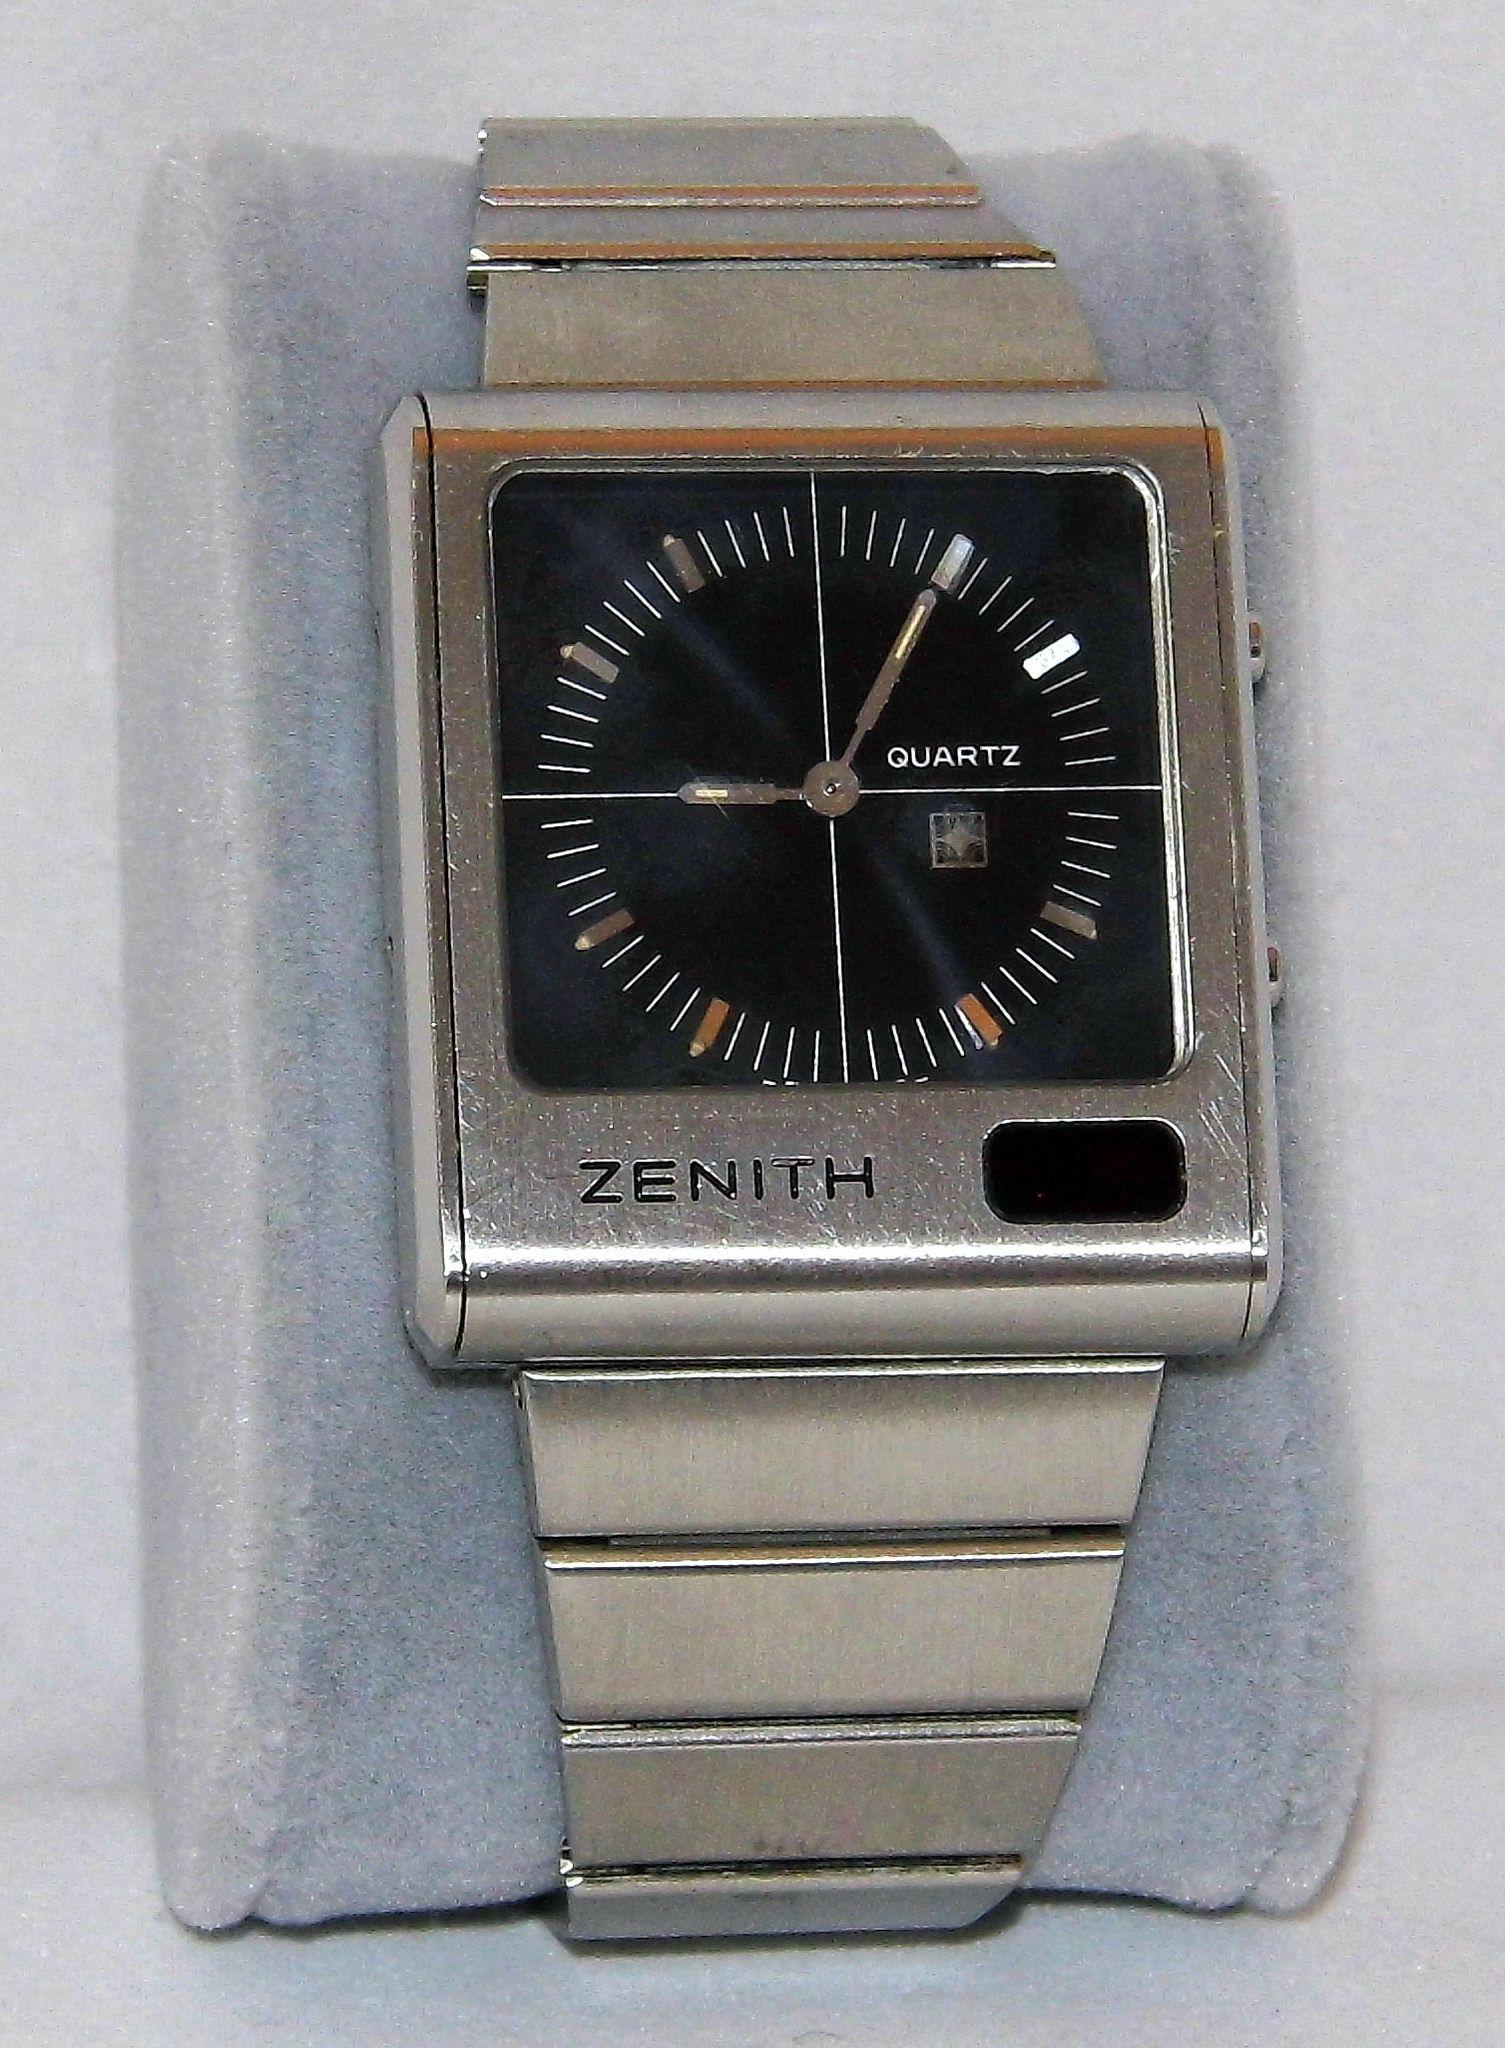 Zenith Watches Zenith Futur Time mand Ana Digi Quartz Watch Black Dial Swiss Made Circa 1975